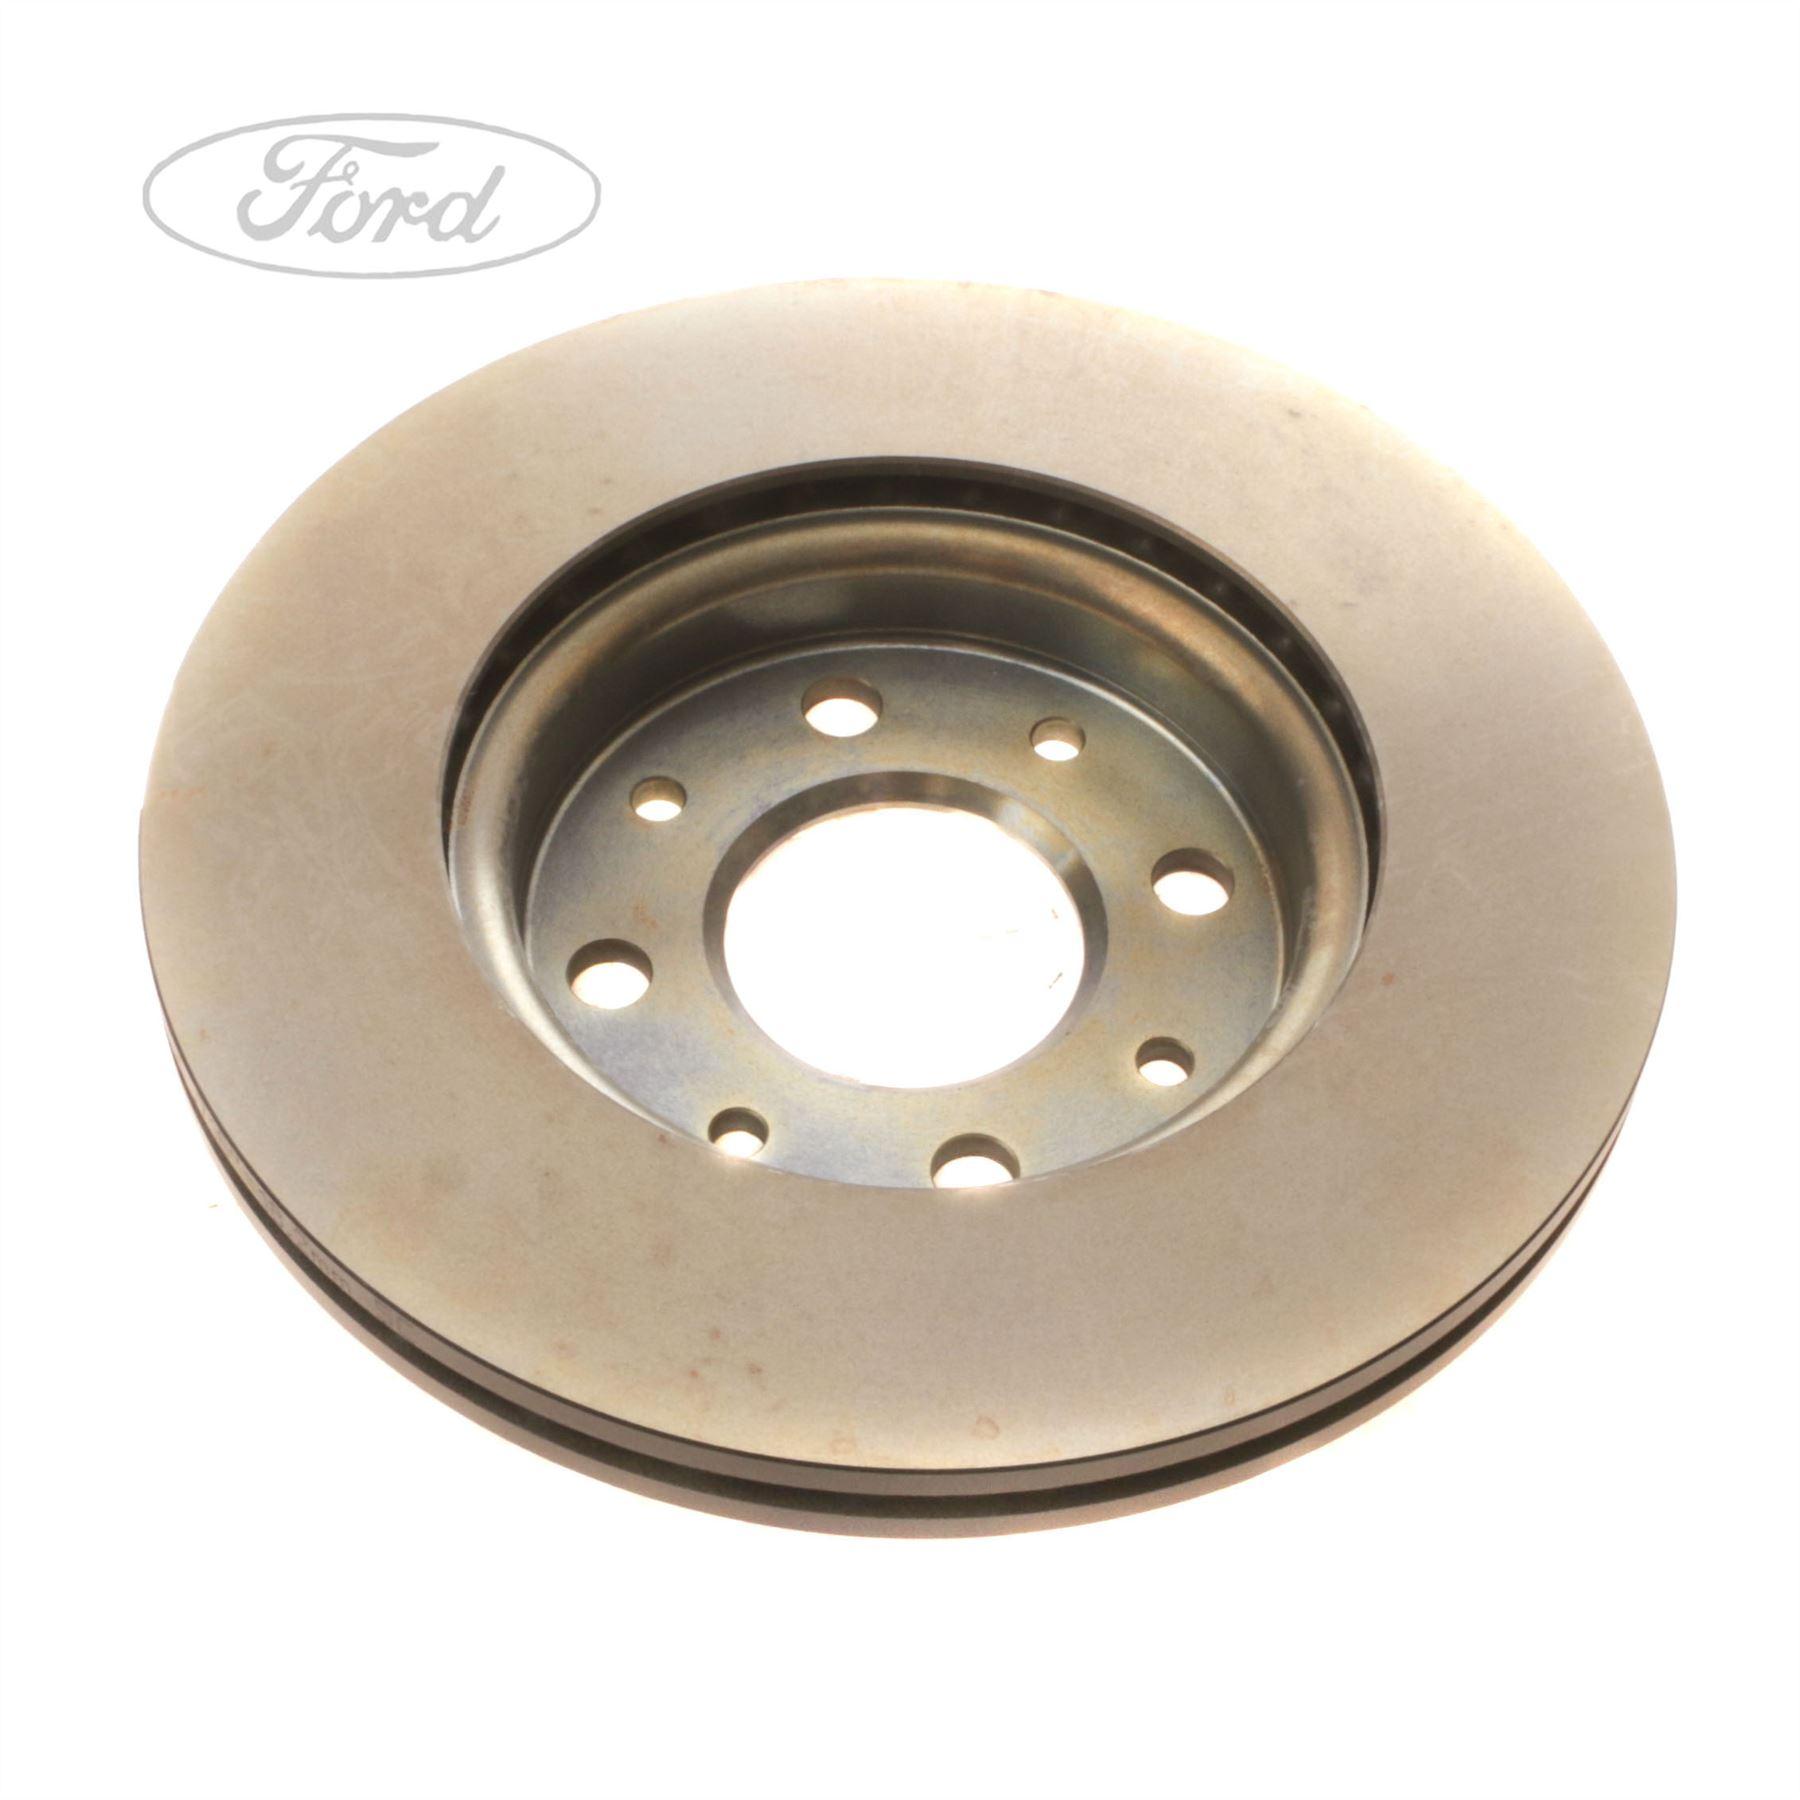 Vented 2000-2007 Ford KA 1.3 Front Brake Disc /& Pads